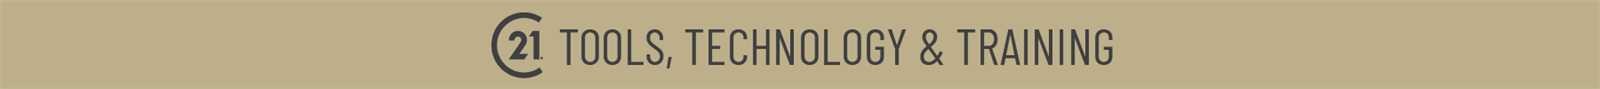 TOOL-TECHNOLOGY-TRAINING